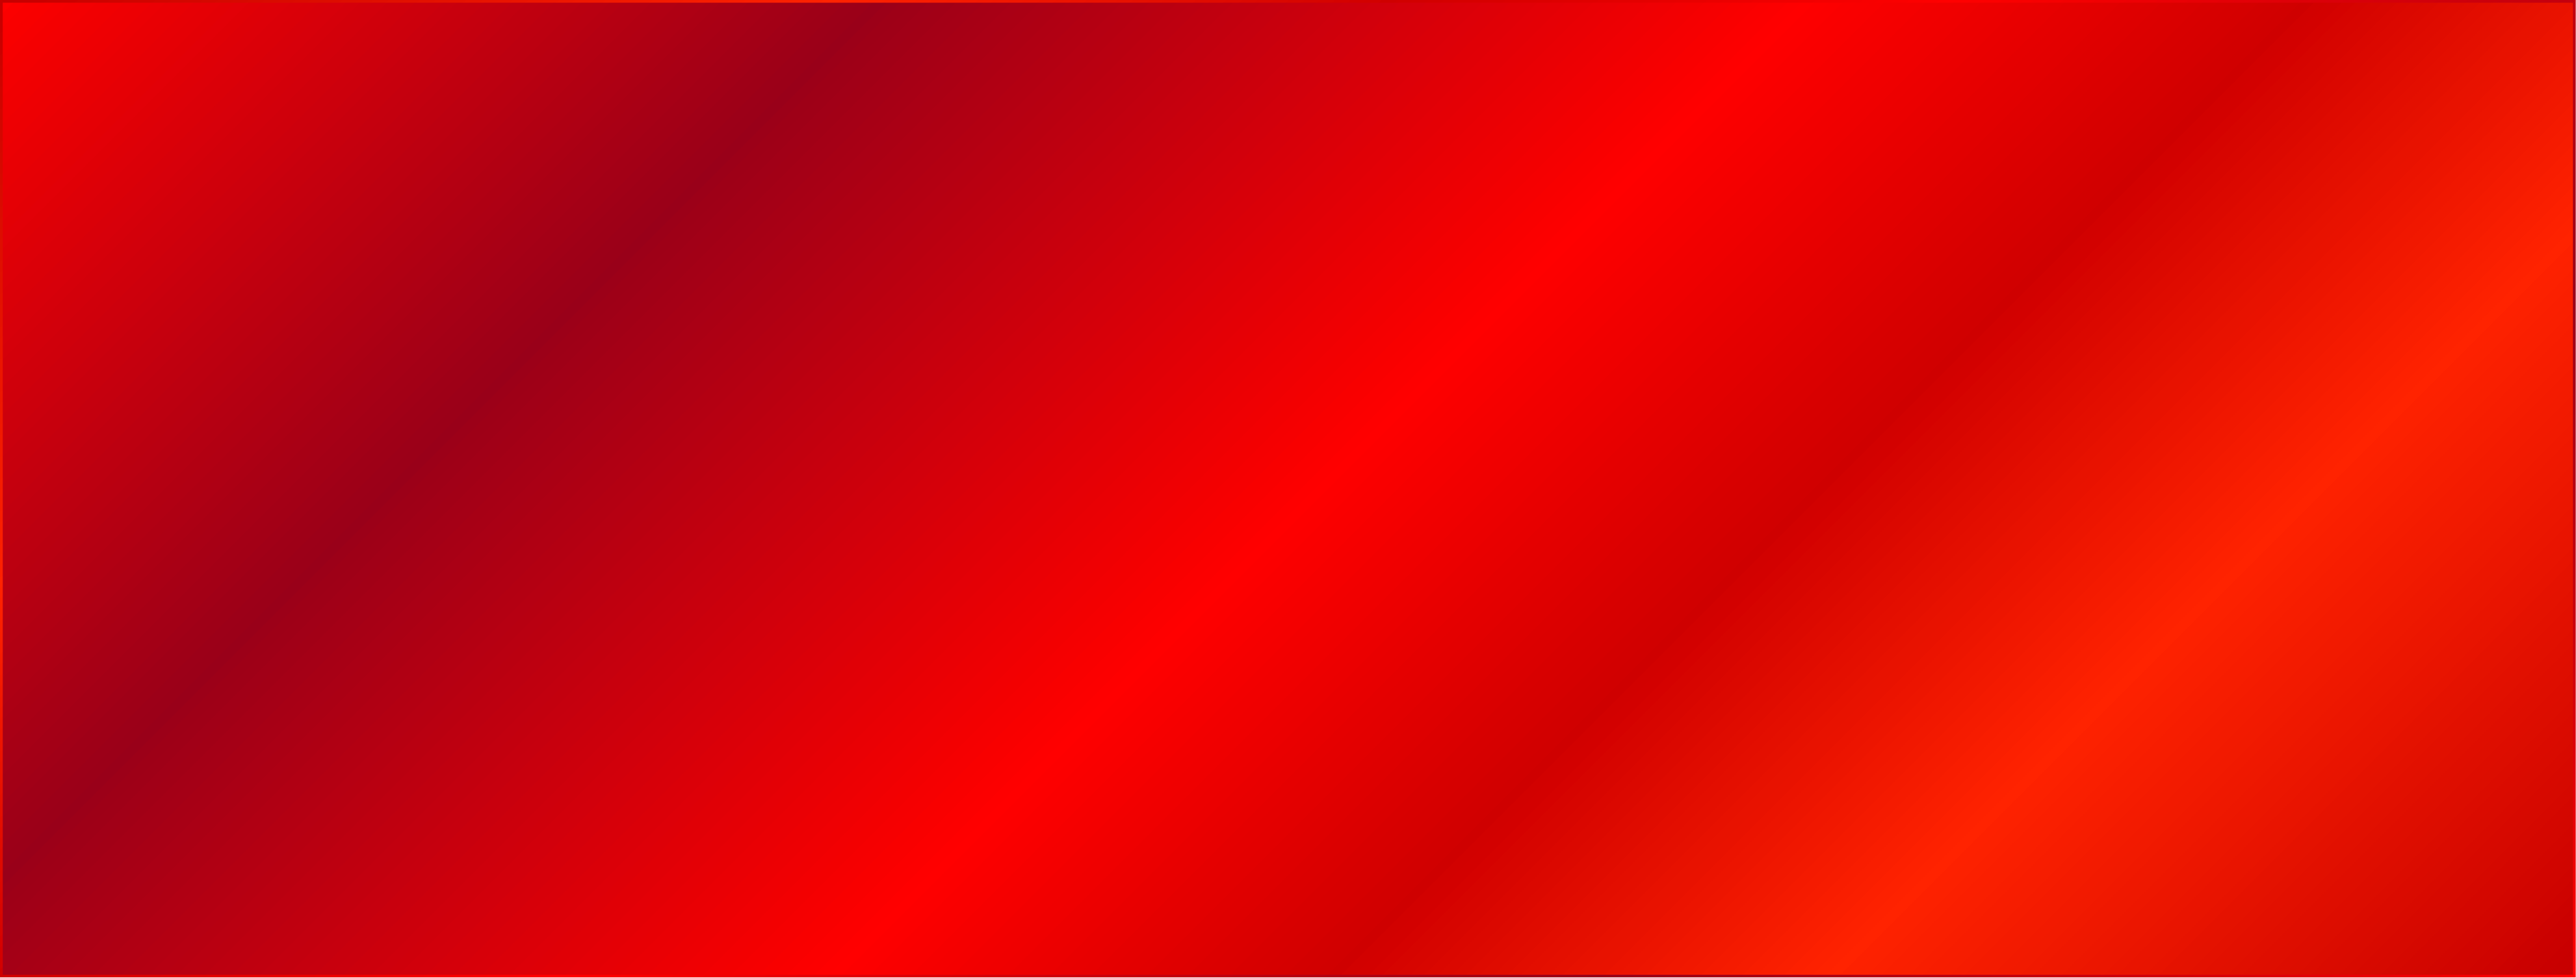 Diagonal-Red-Background-180-apart